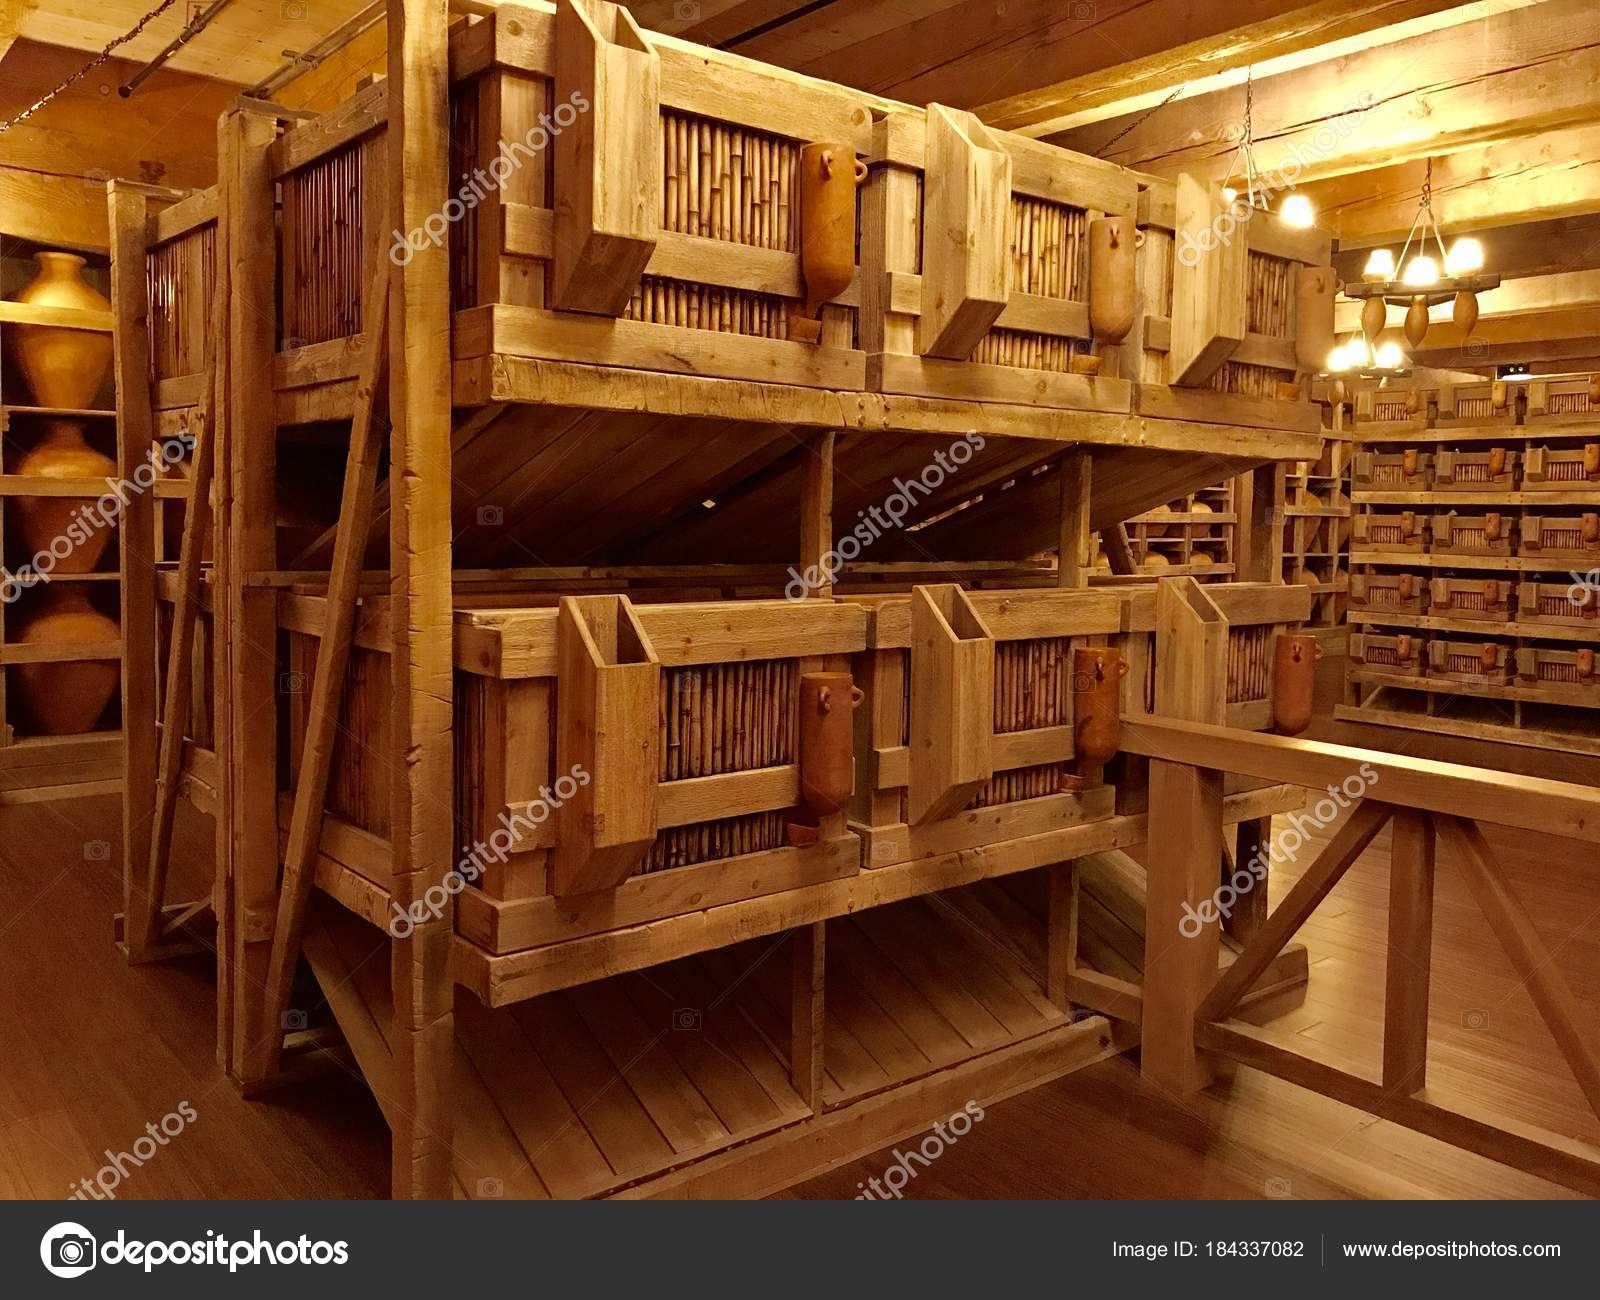 Williamstown Usa November 2017 Animal Cages Noah Ark Replica Ark